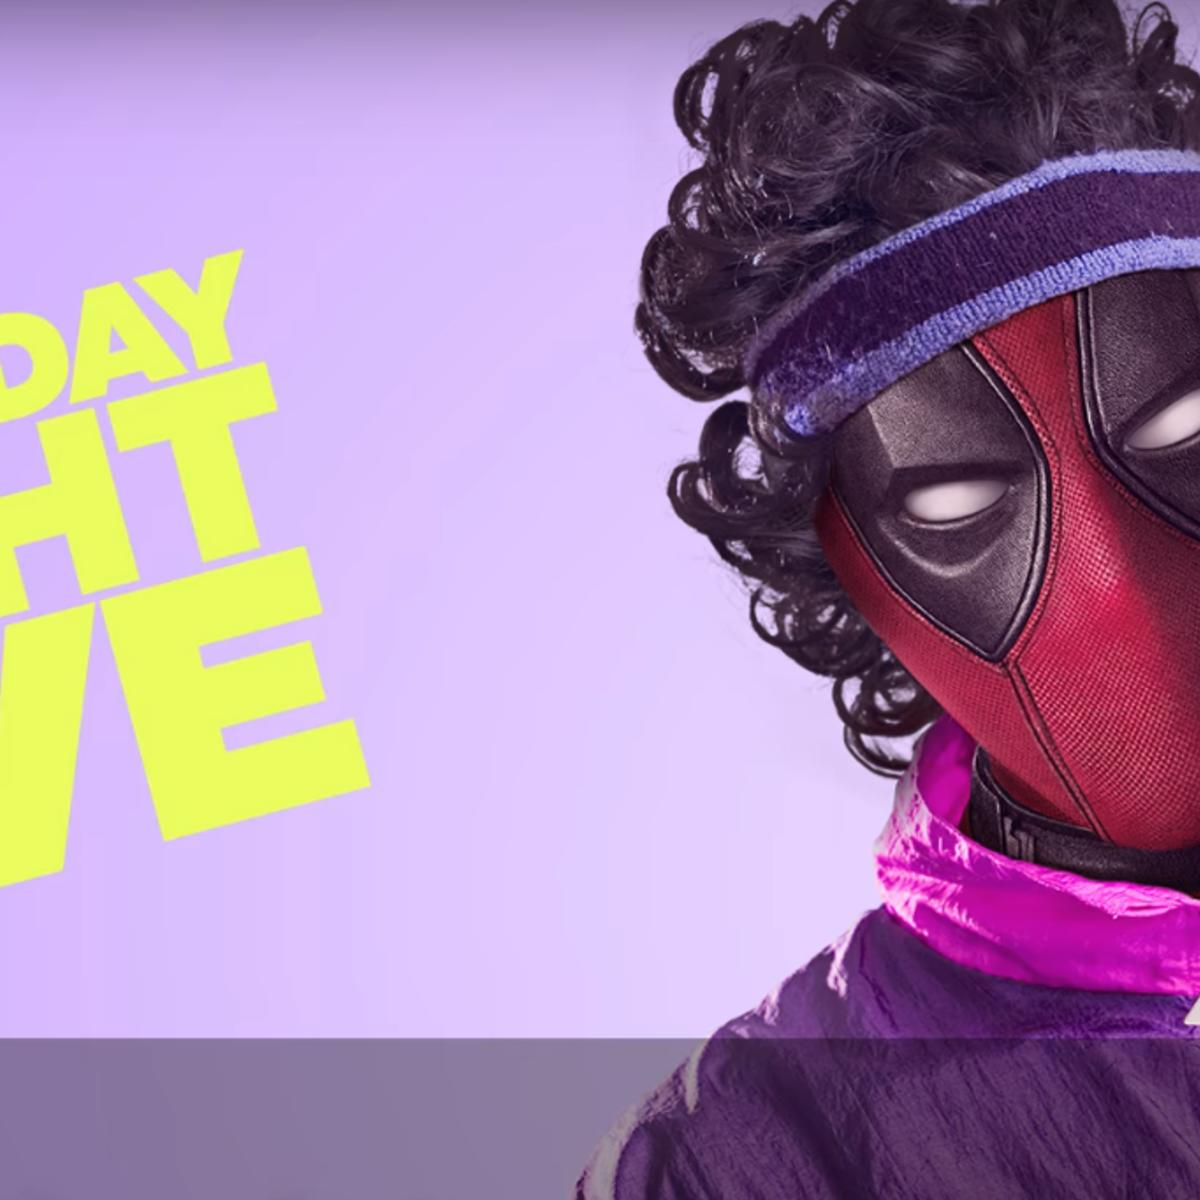 Deadpool-SNL-video-1_0.png